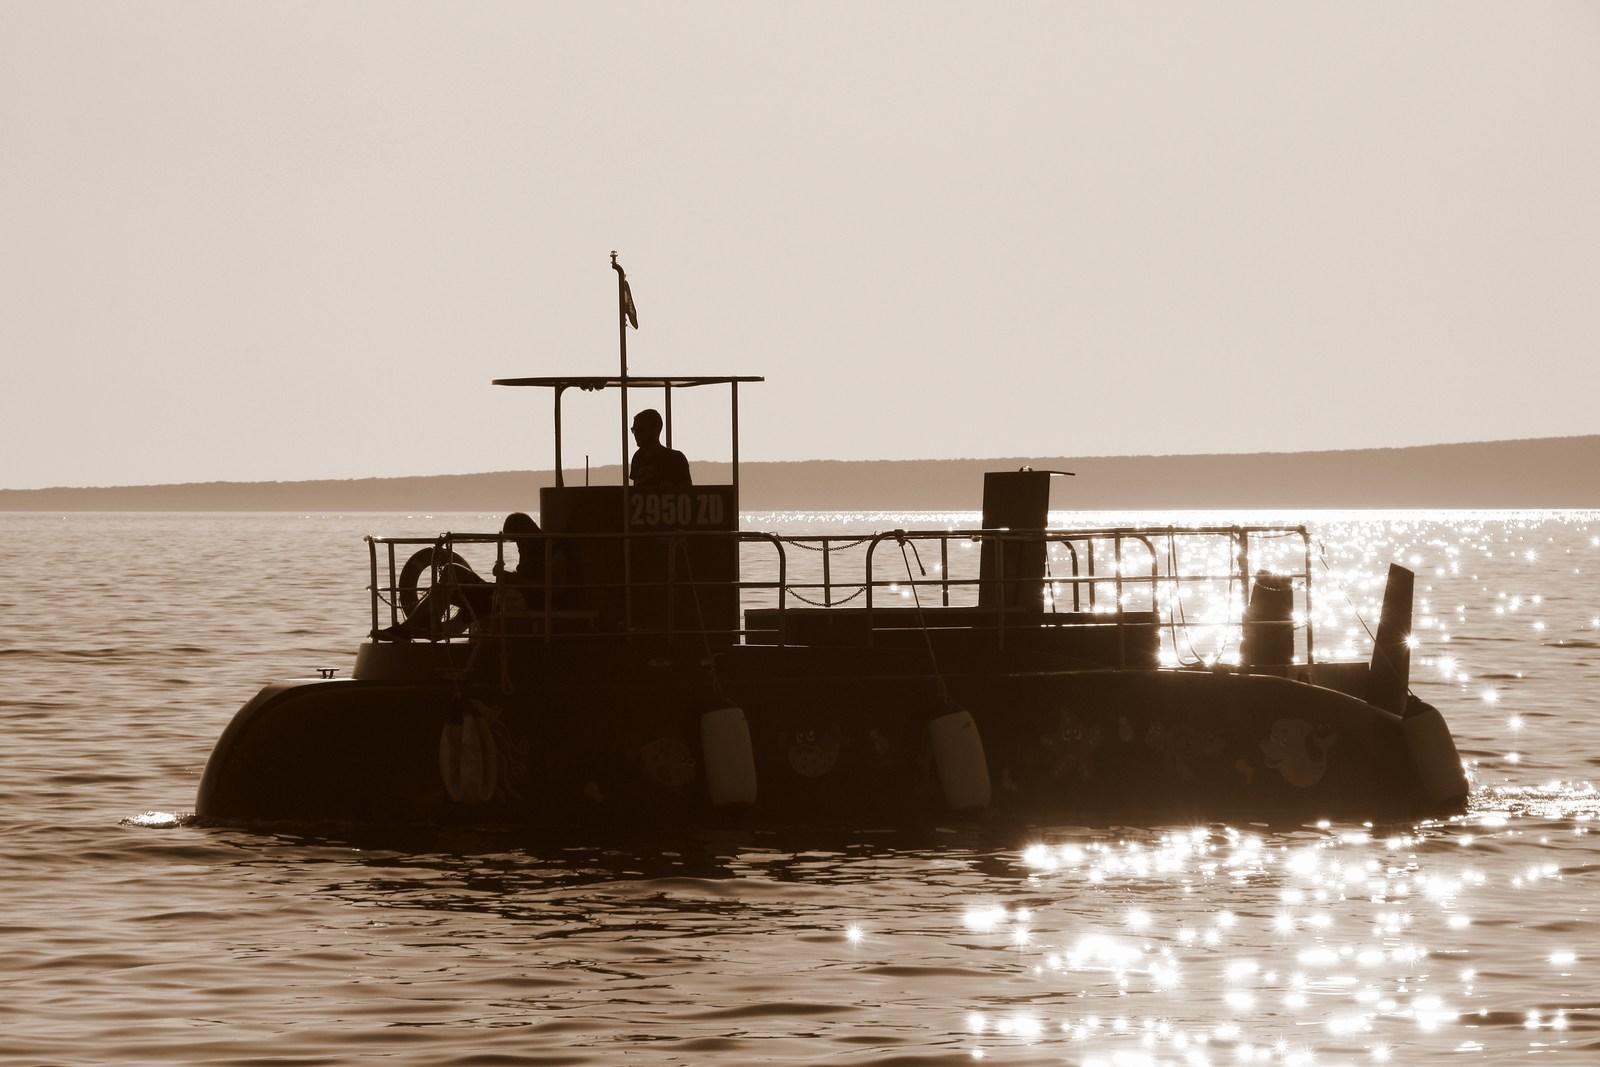 Popolni užitki na krovu turistične ladje.